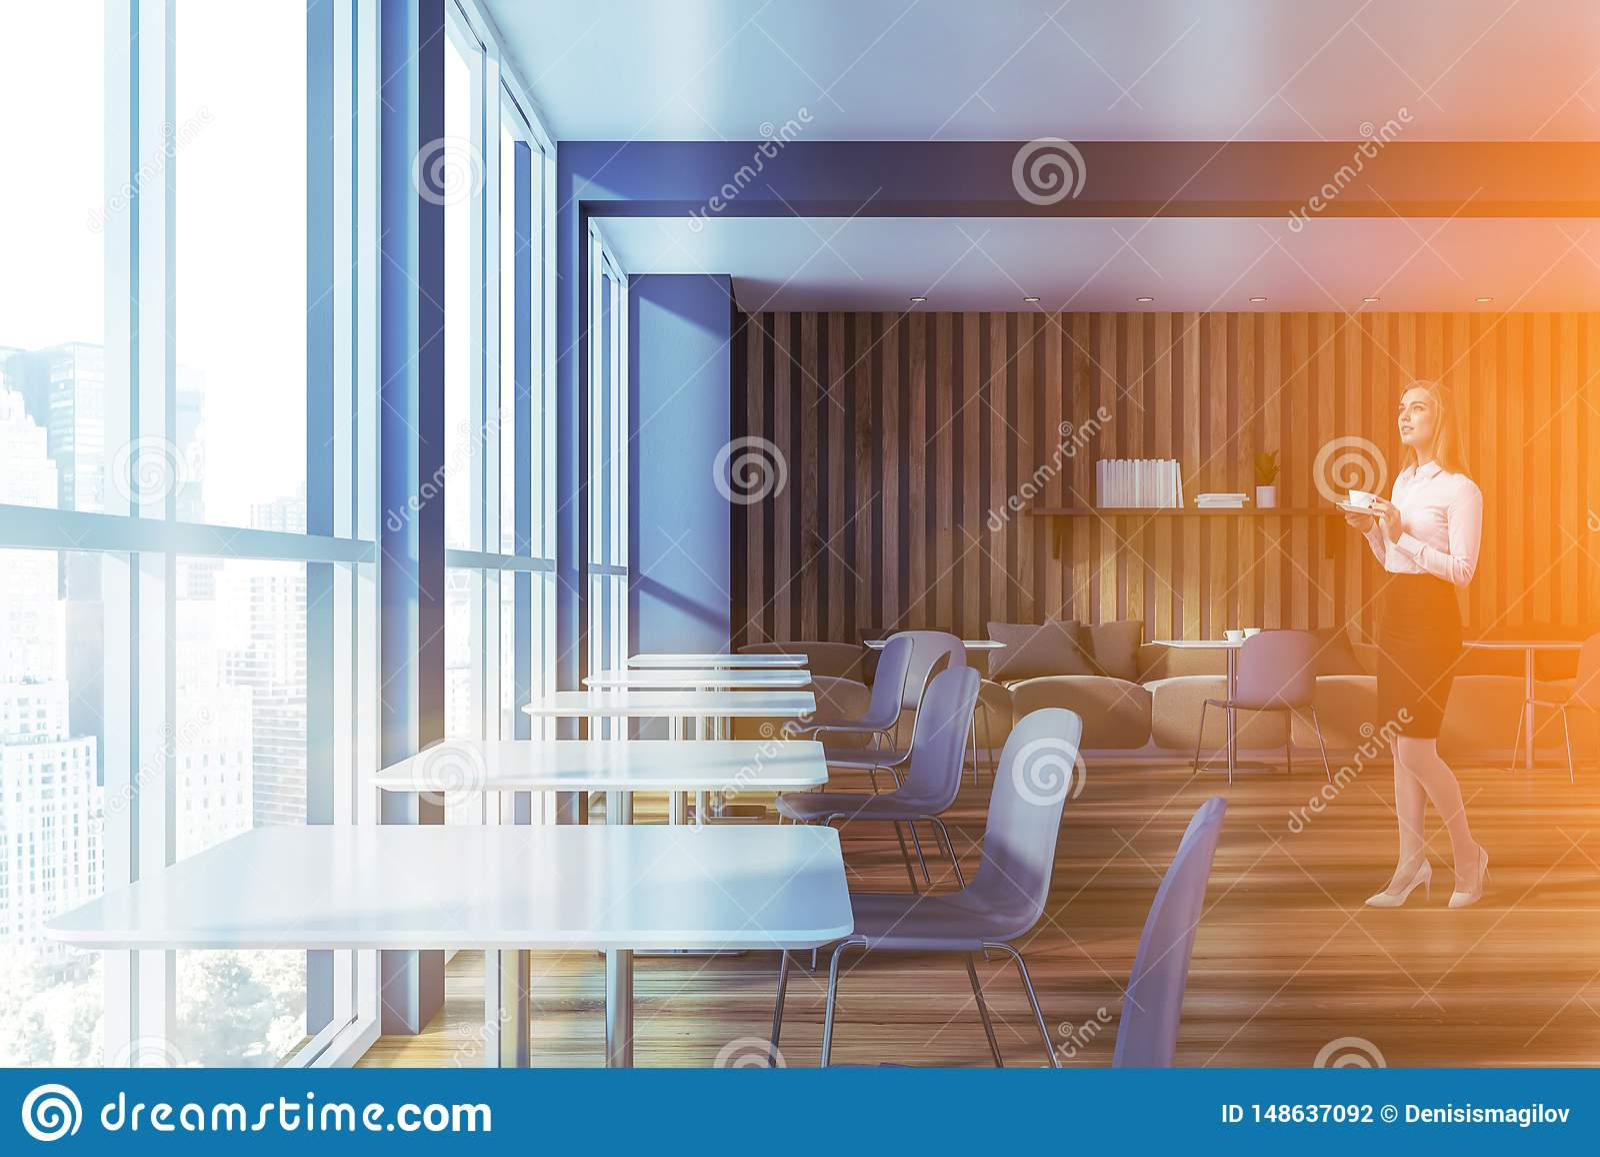 Femme blonde en caf? gris et en bois avec des sofas